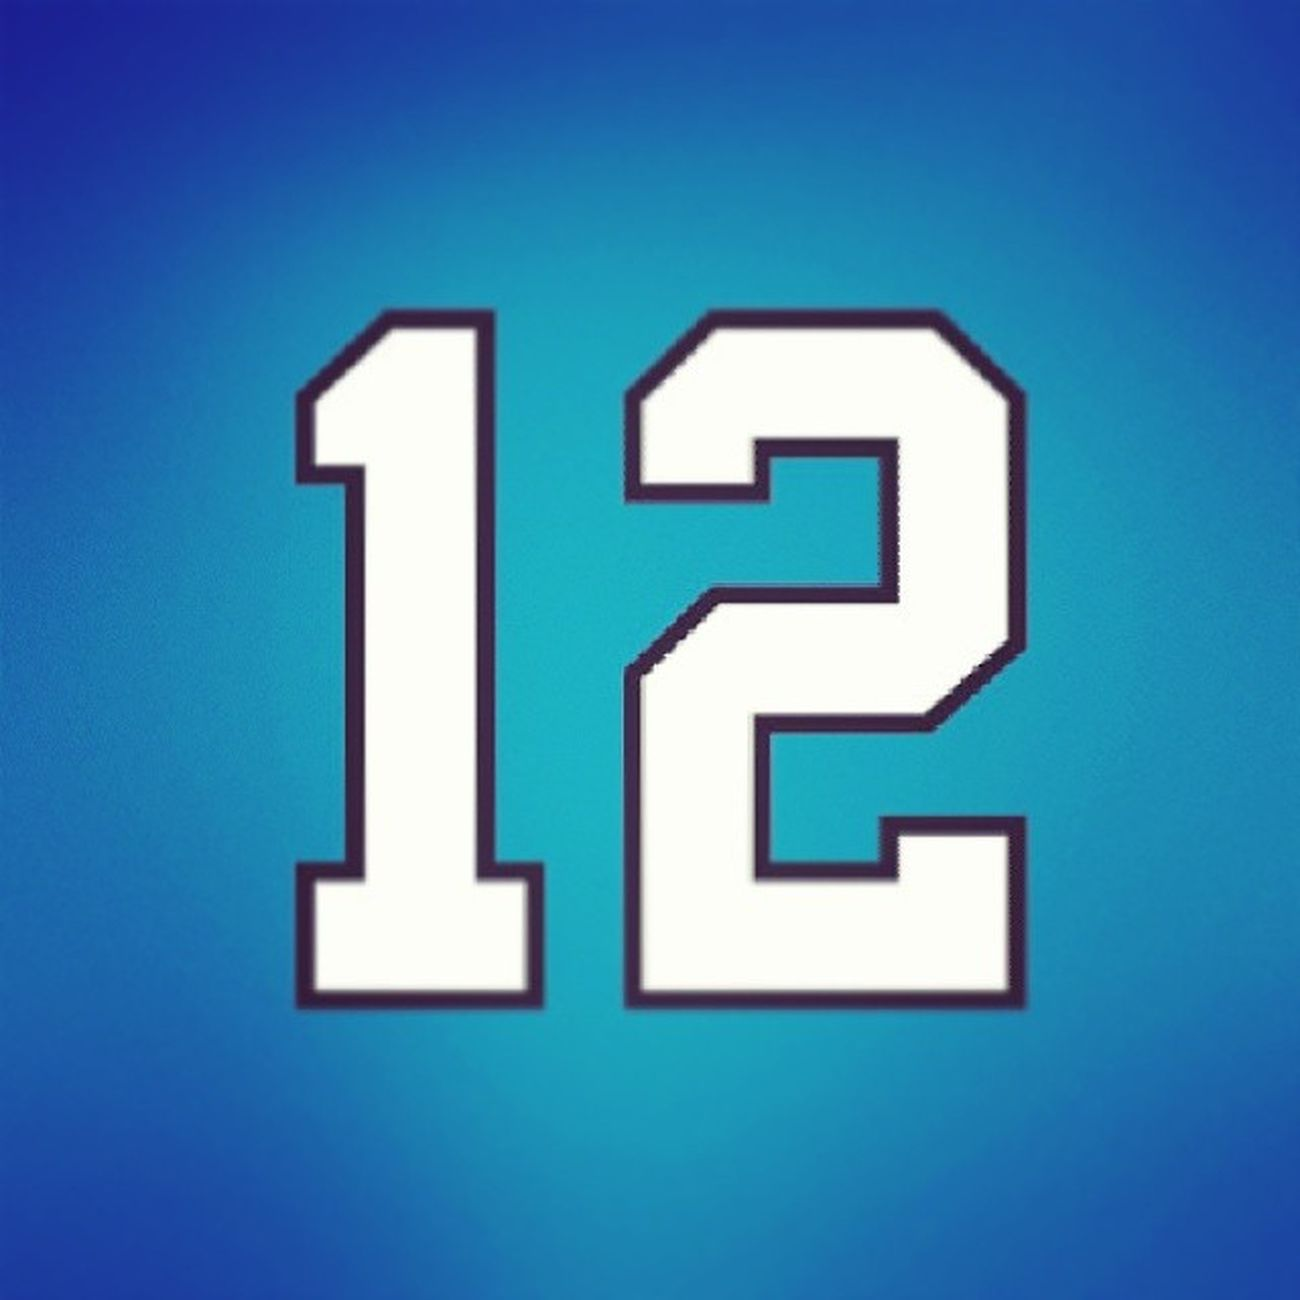 12s Seahawks